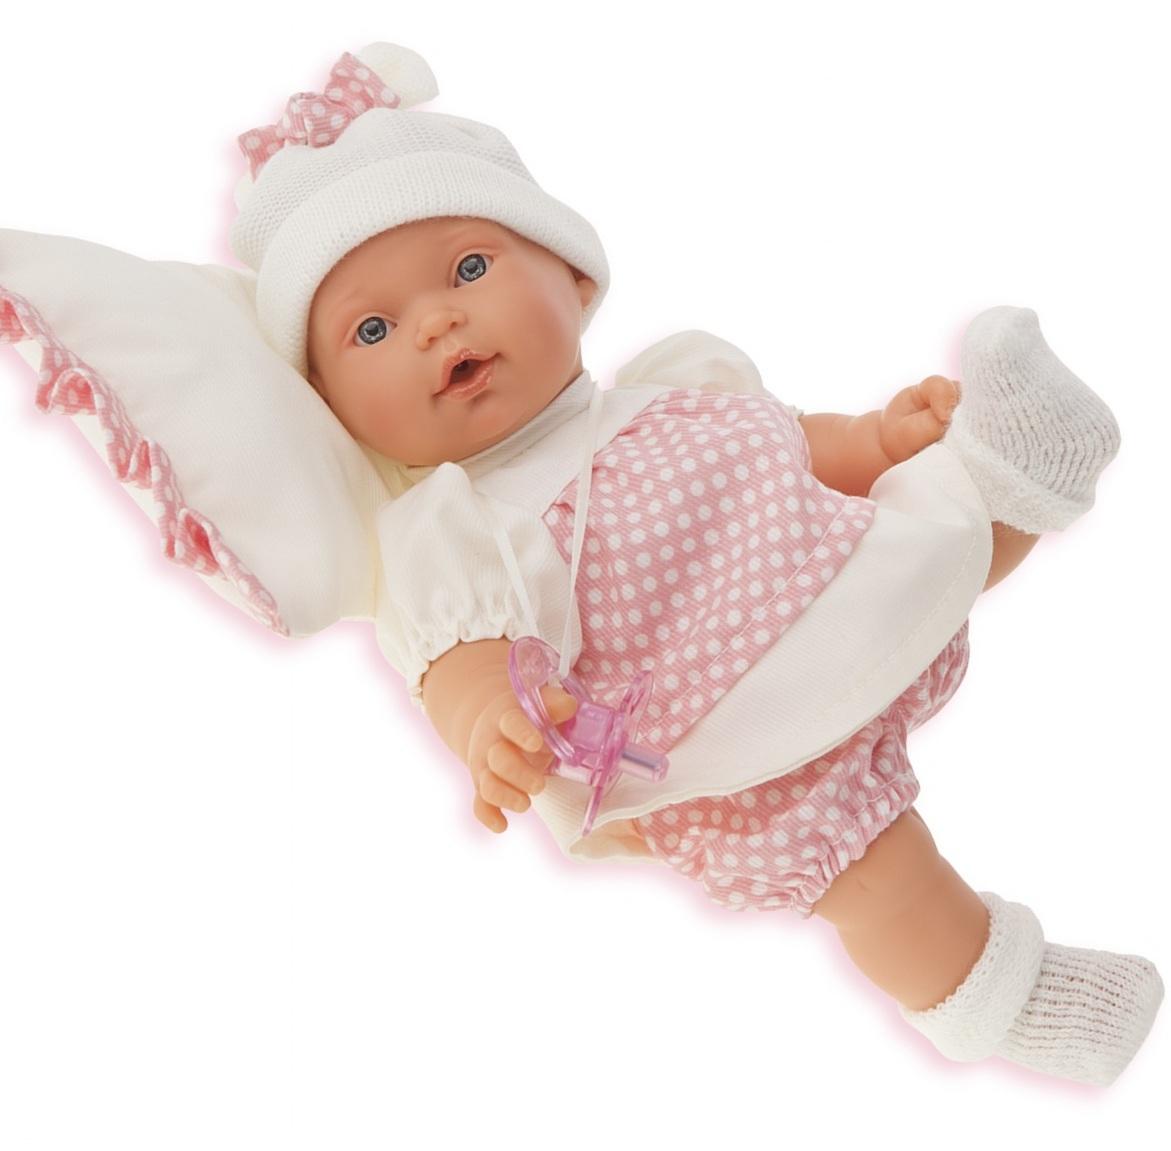 Купить Кукла Ланита на бежевой подушке, 27 см, плачет, Antonio Juans Munecas